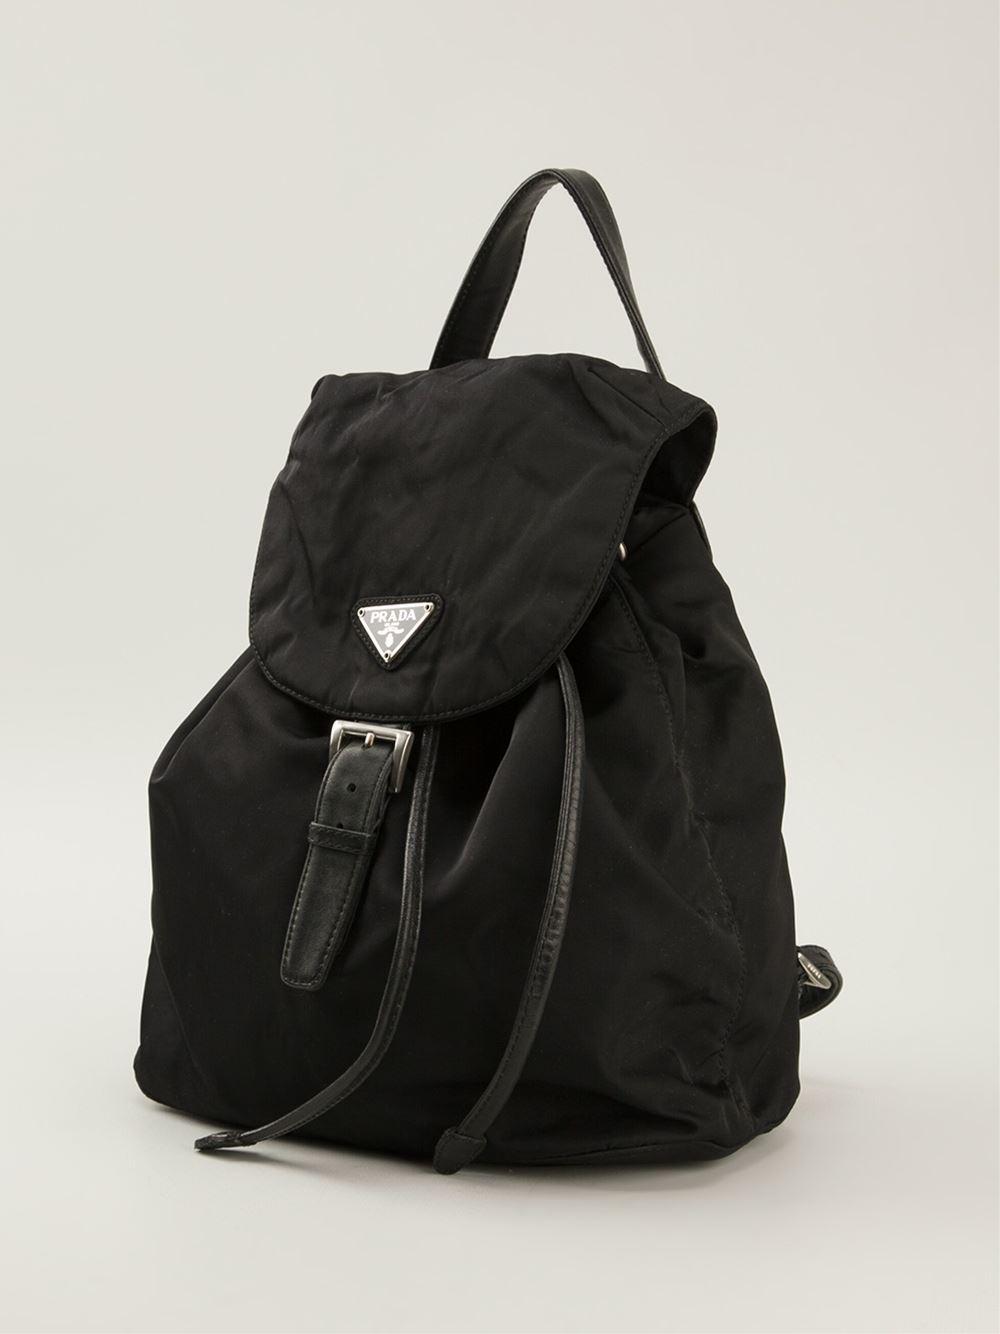 brown leather prada handbag - prada vintage eyelet backpack, prada alligator handbag